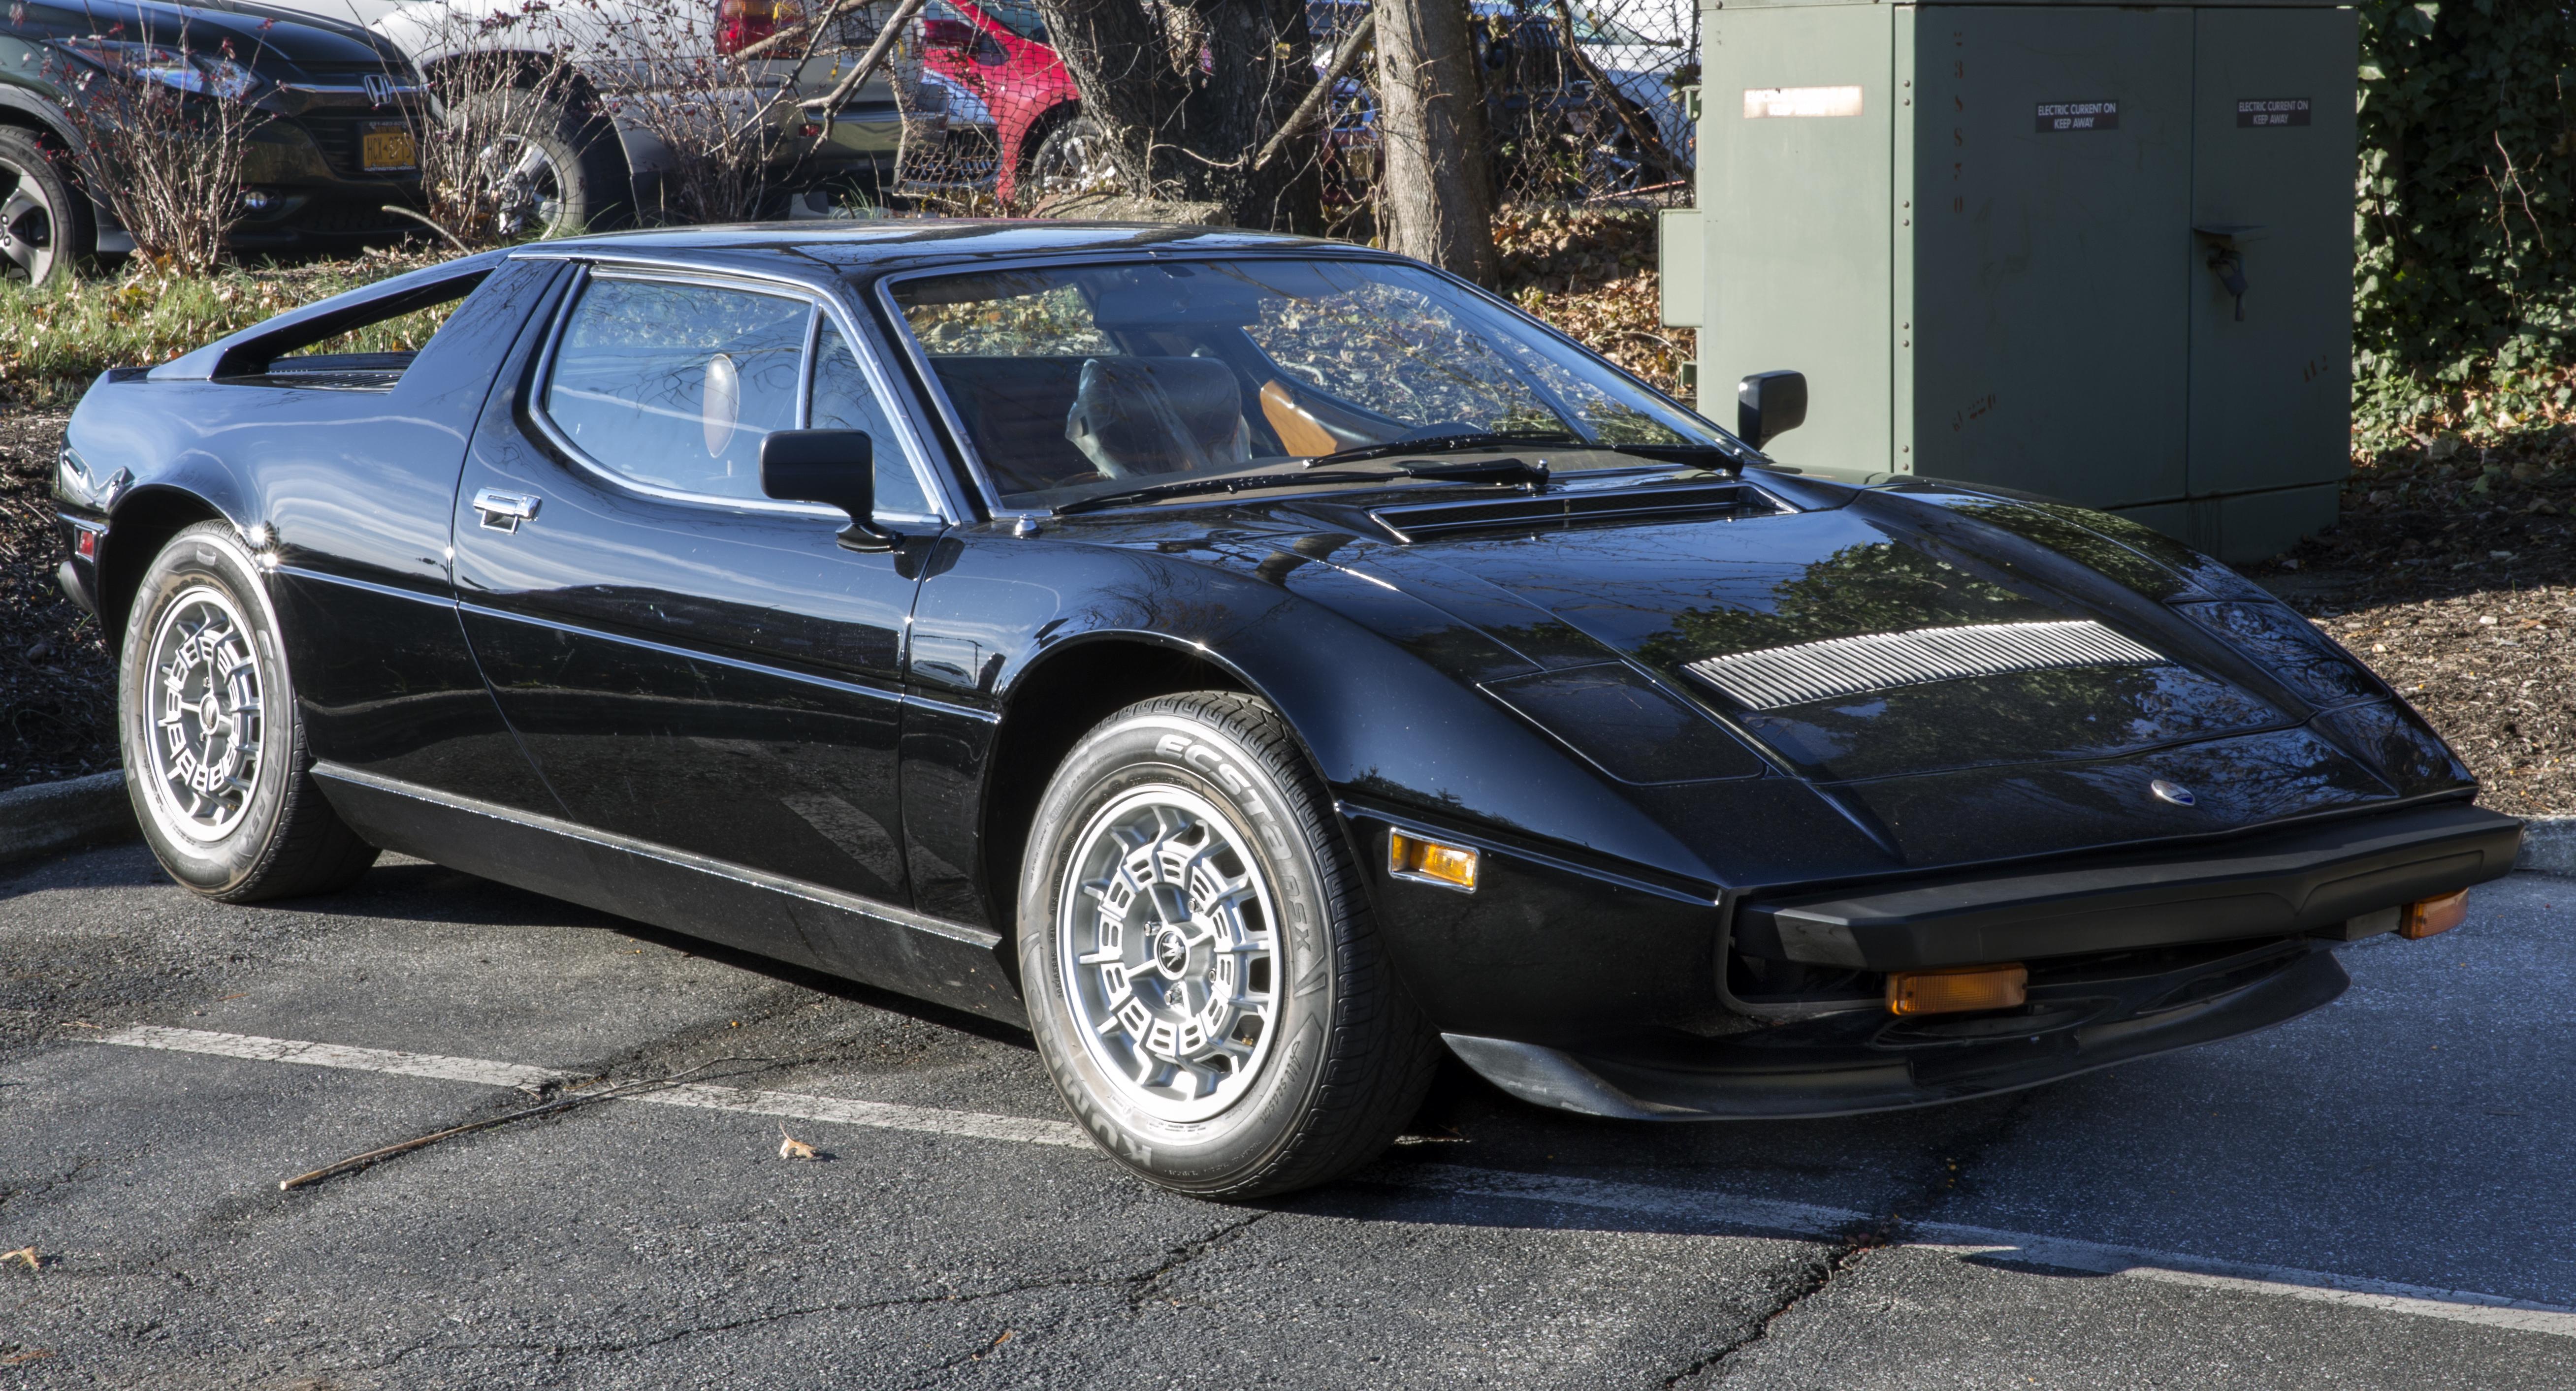 1980_Maserati_Merak_SS_%28US_model%29_in_Black%2C_front_right.jpg